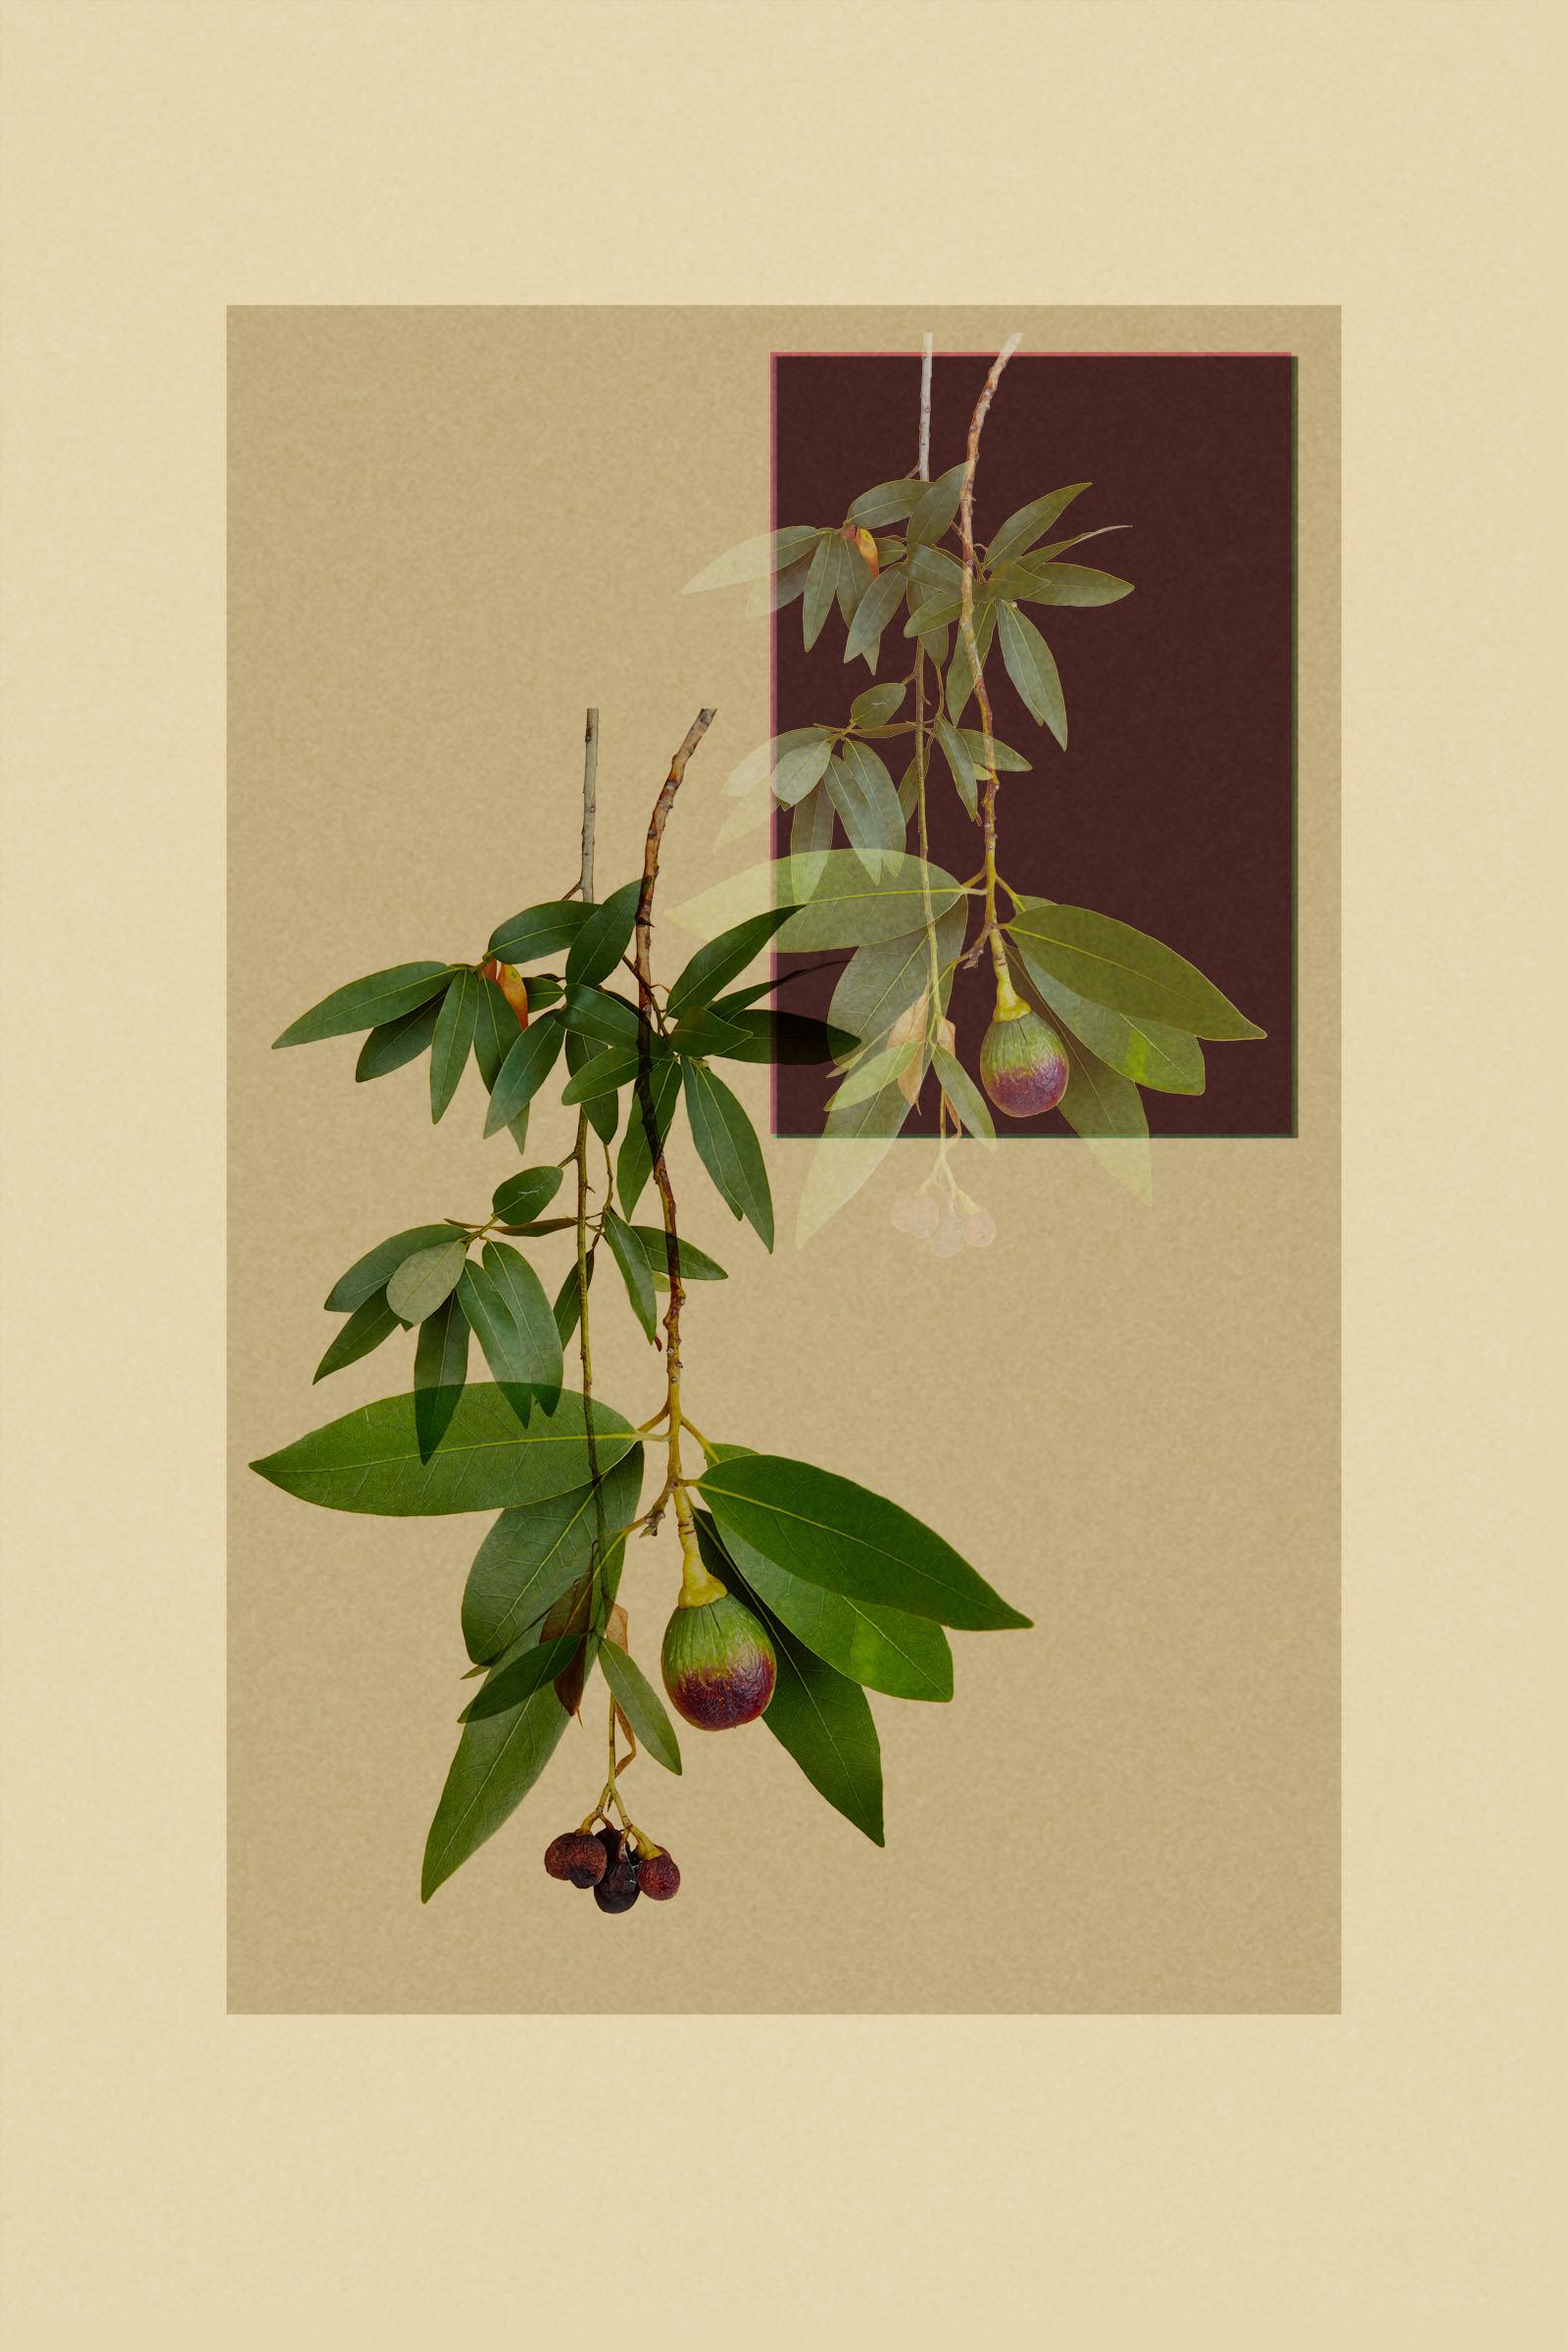 TEST - hanging plants0585-2.jpg